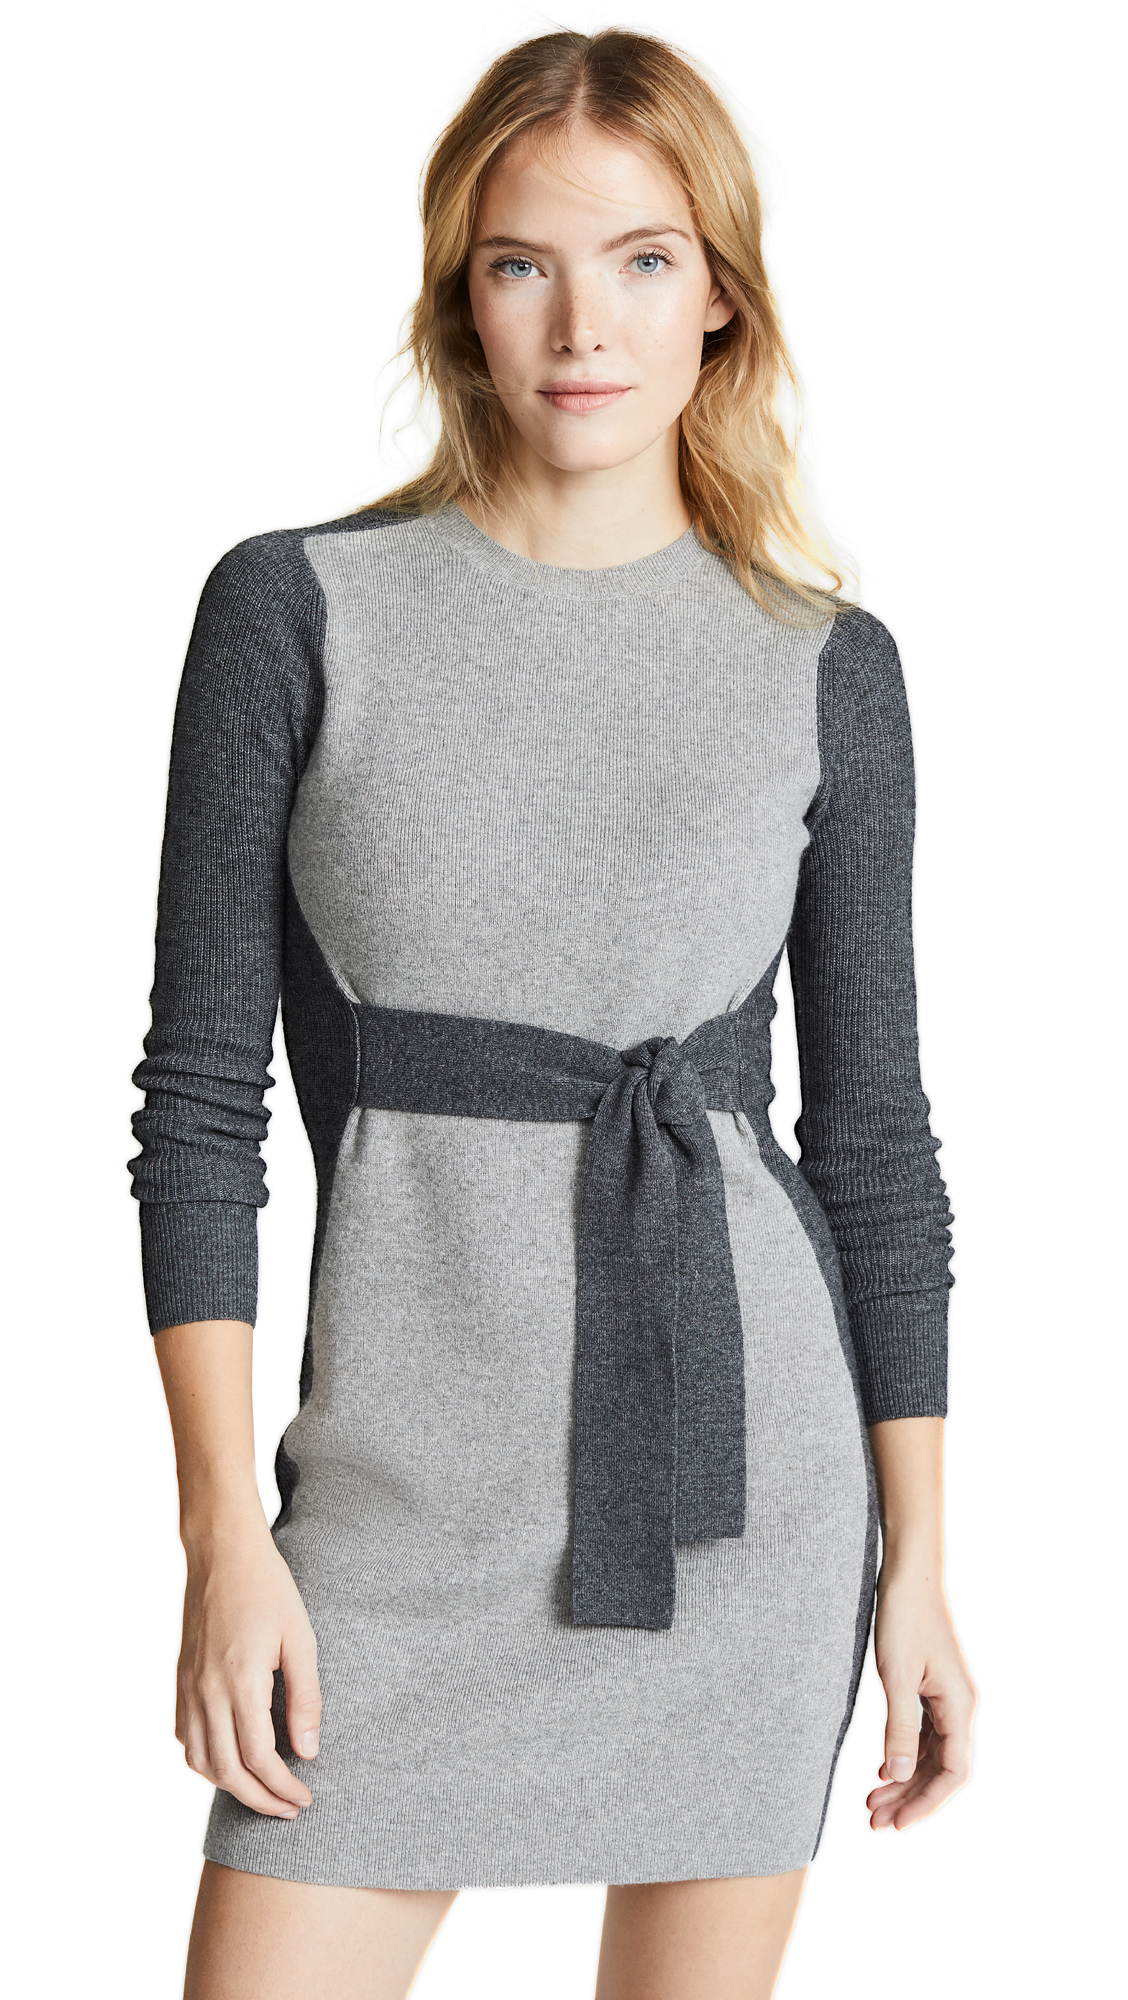 Club Monaco Arnettie Dress - Grey Combo